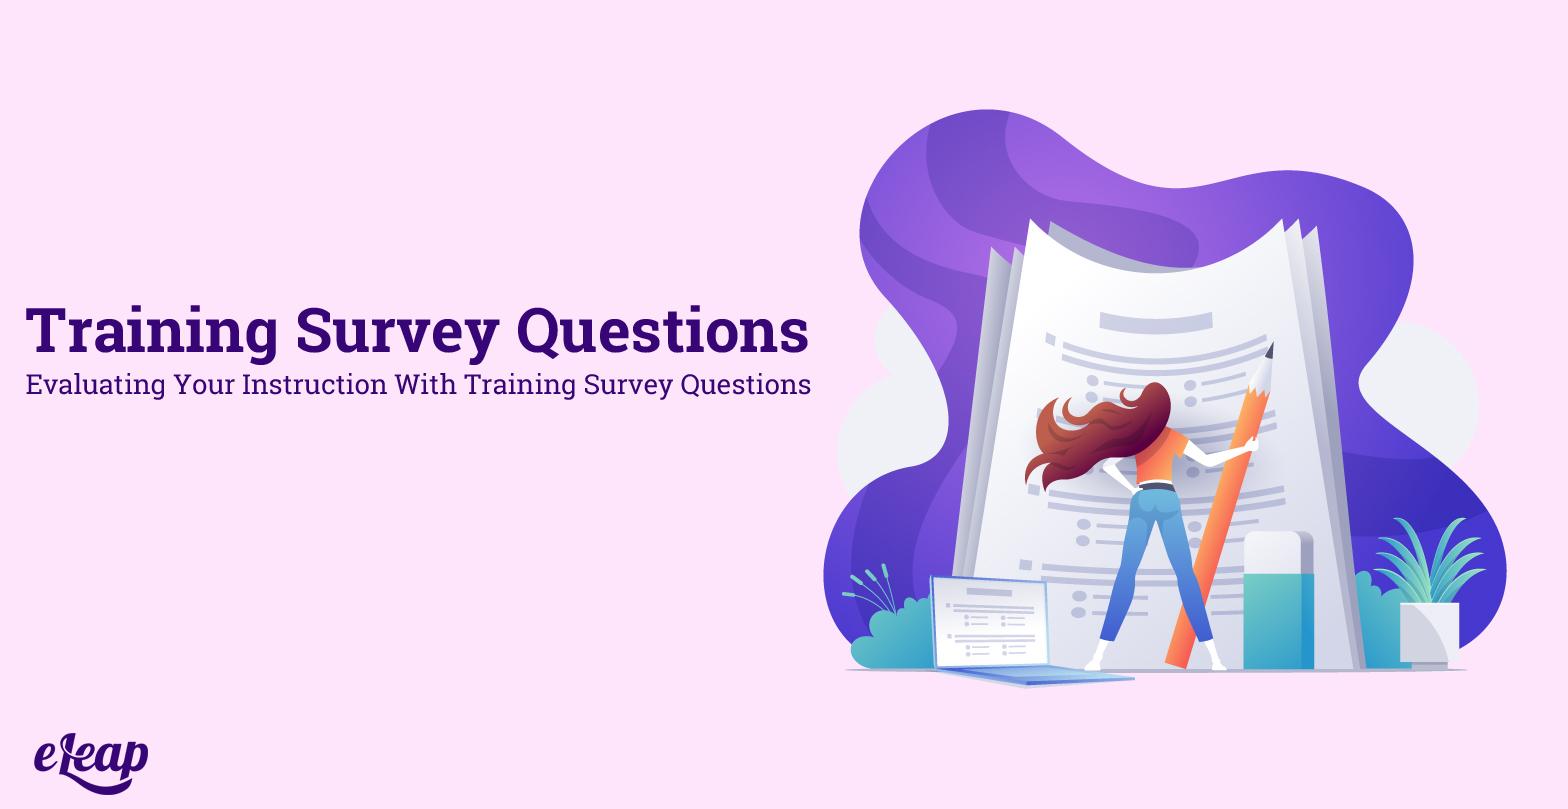 Training Survey Questions